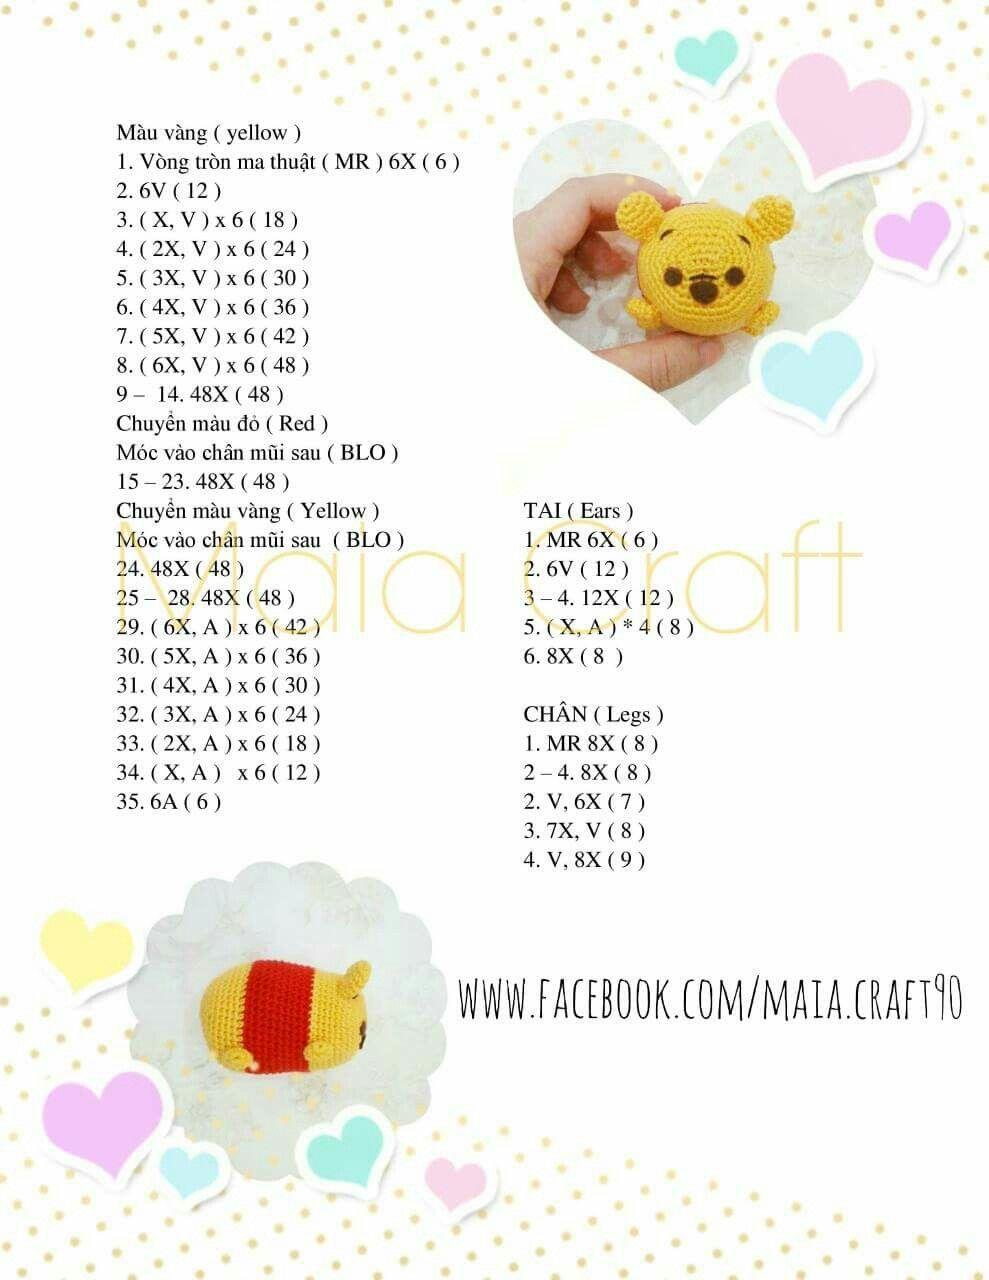 Winnie the pooh | Amigurumis | Pinterest | Patrones amigurumi ...